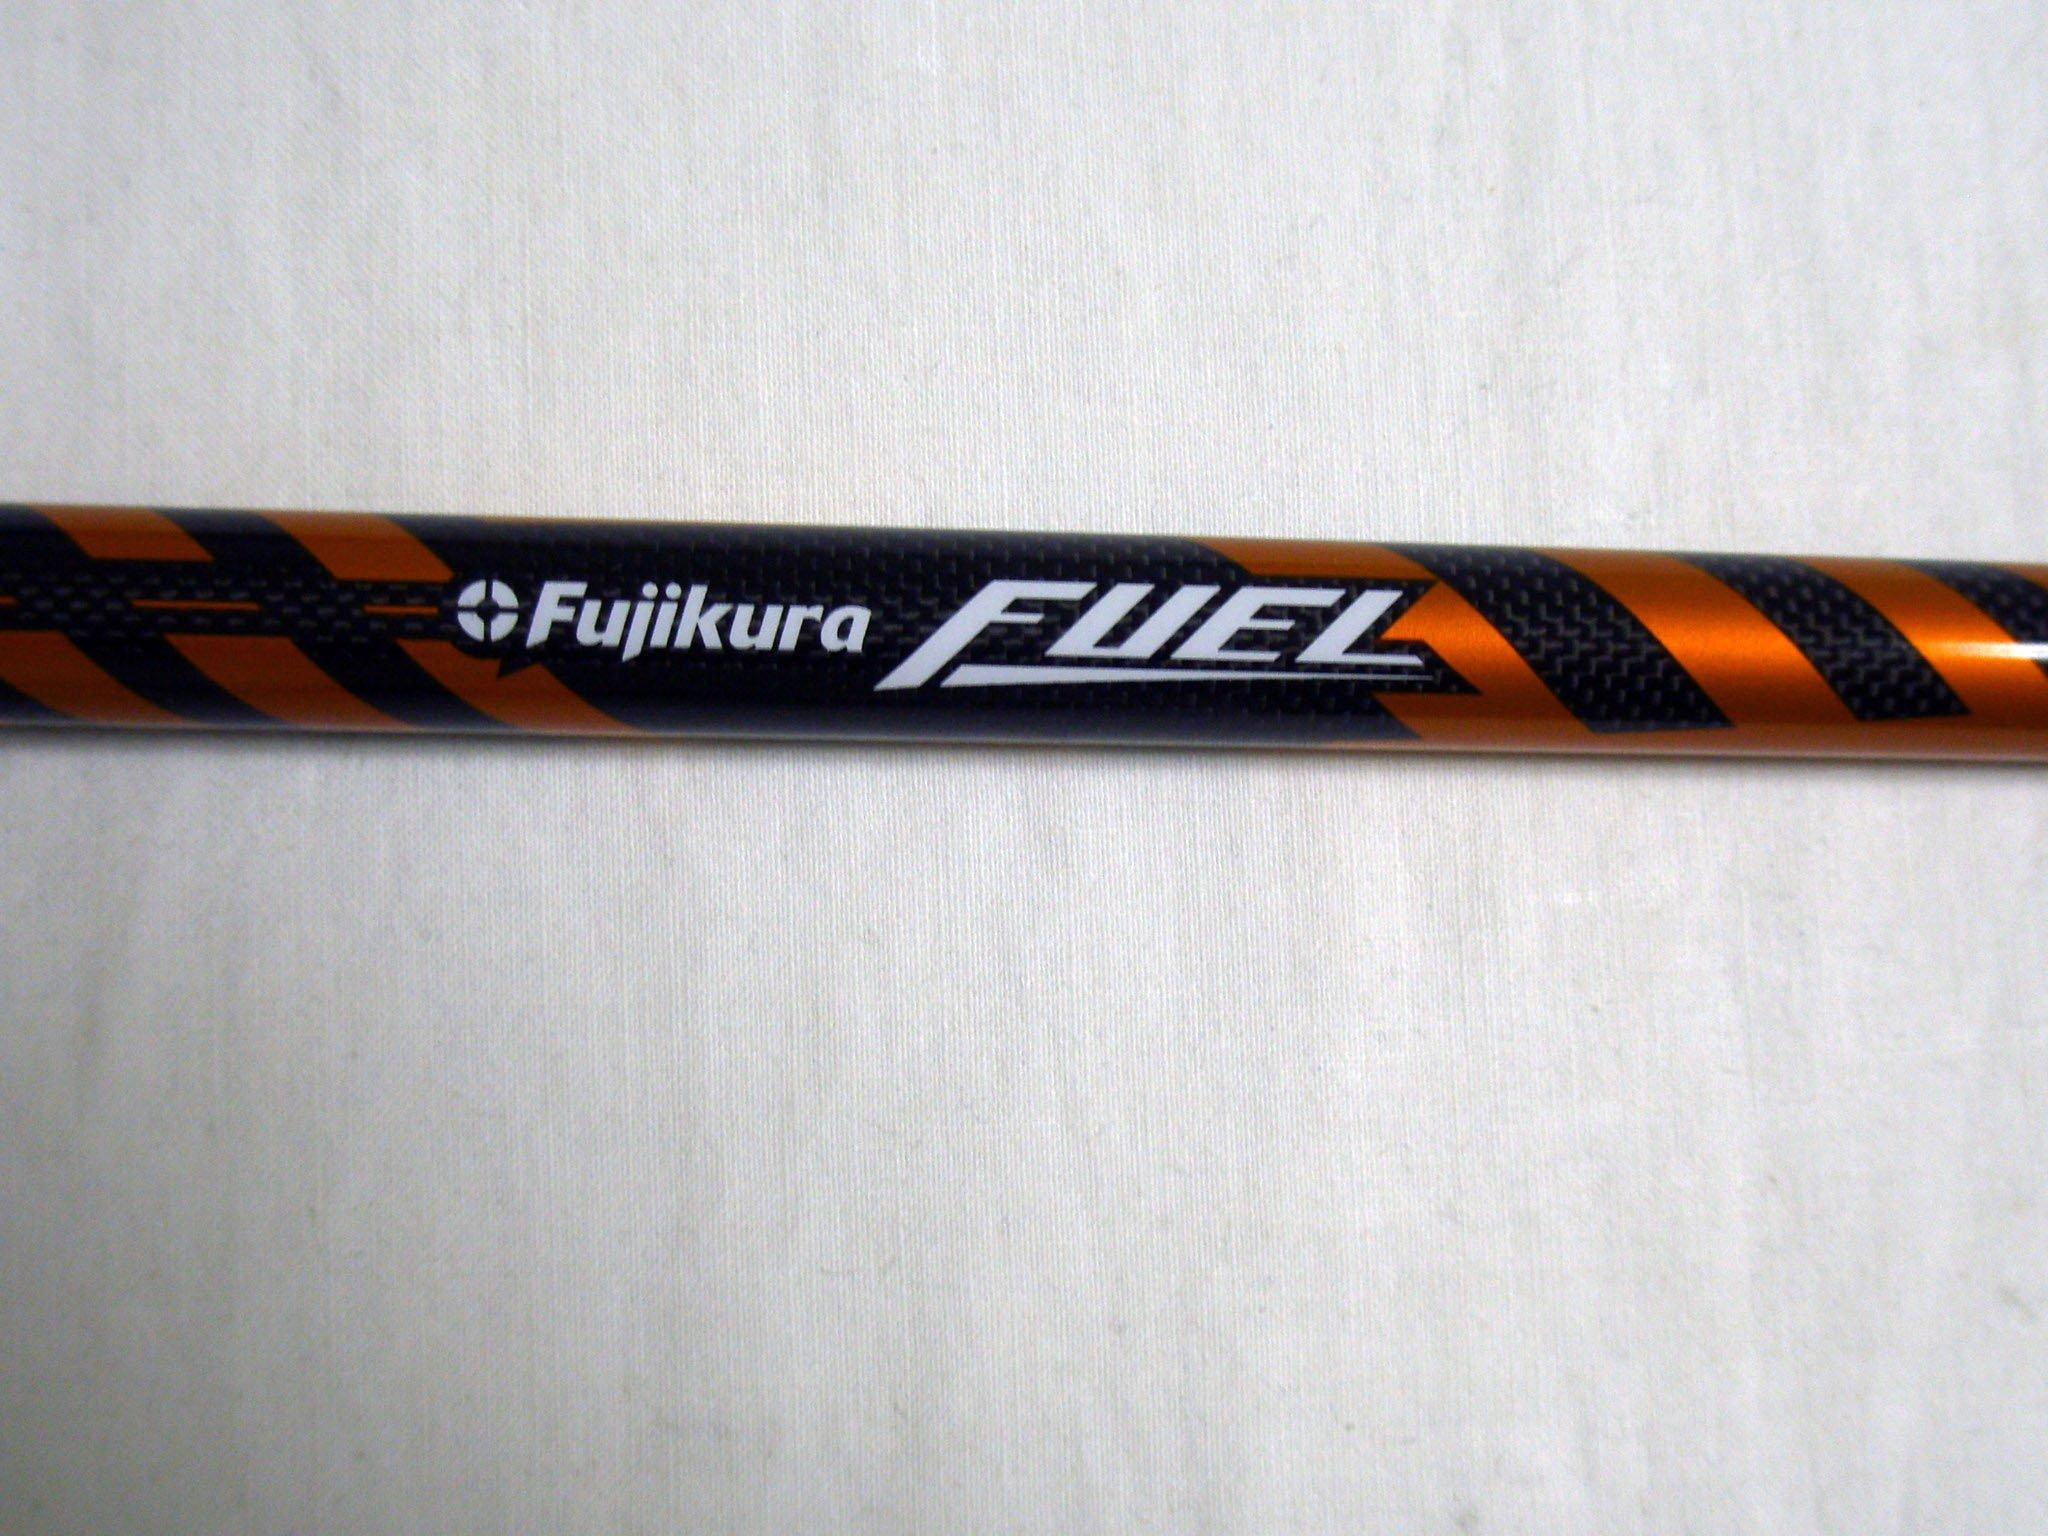 Fujikura Fuel Fairway Wood Shaft (70, XSTIFF, .335'') Golf